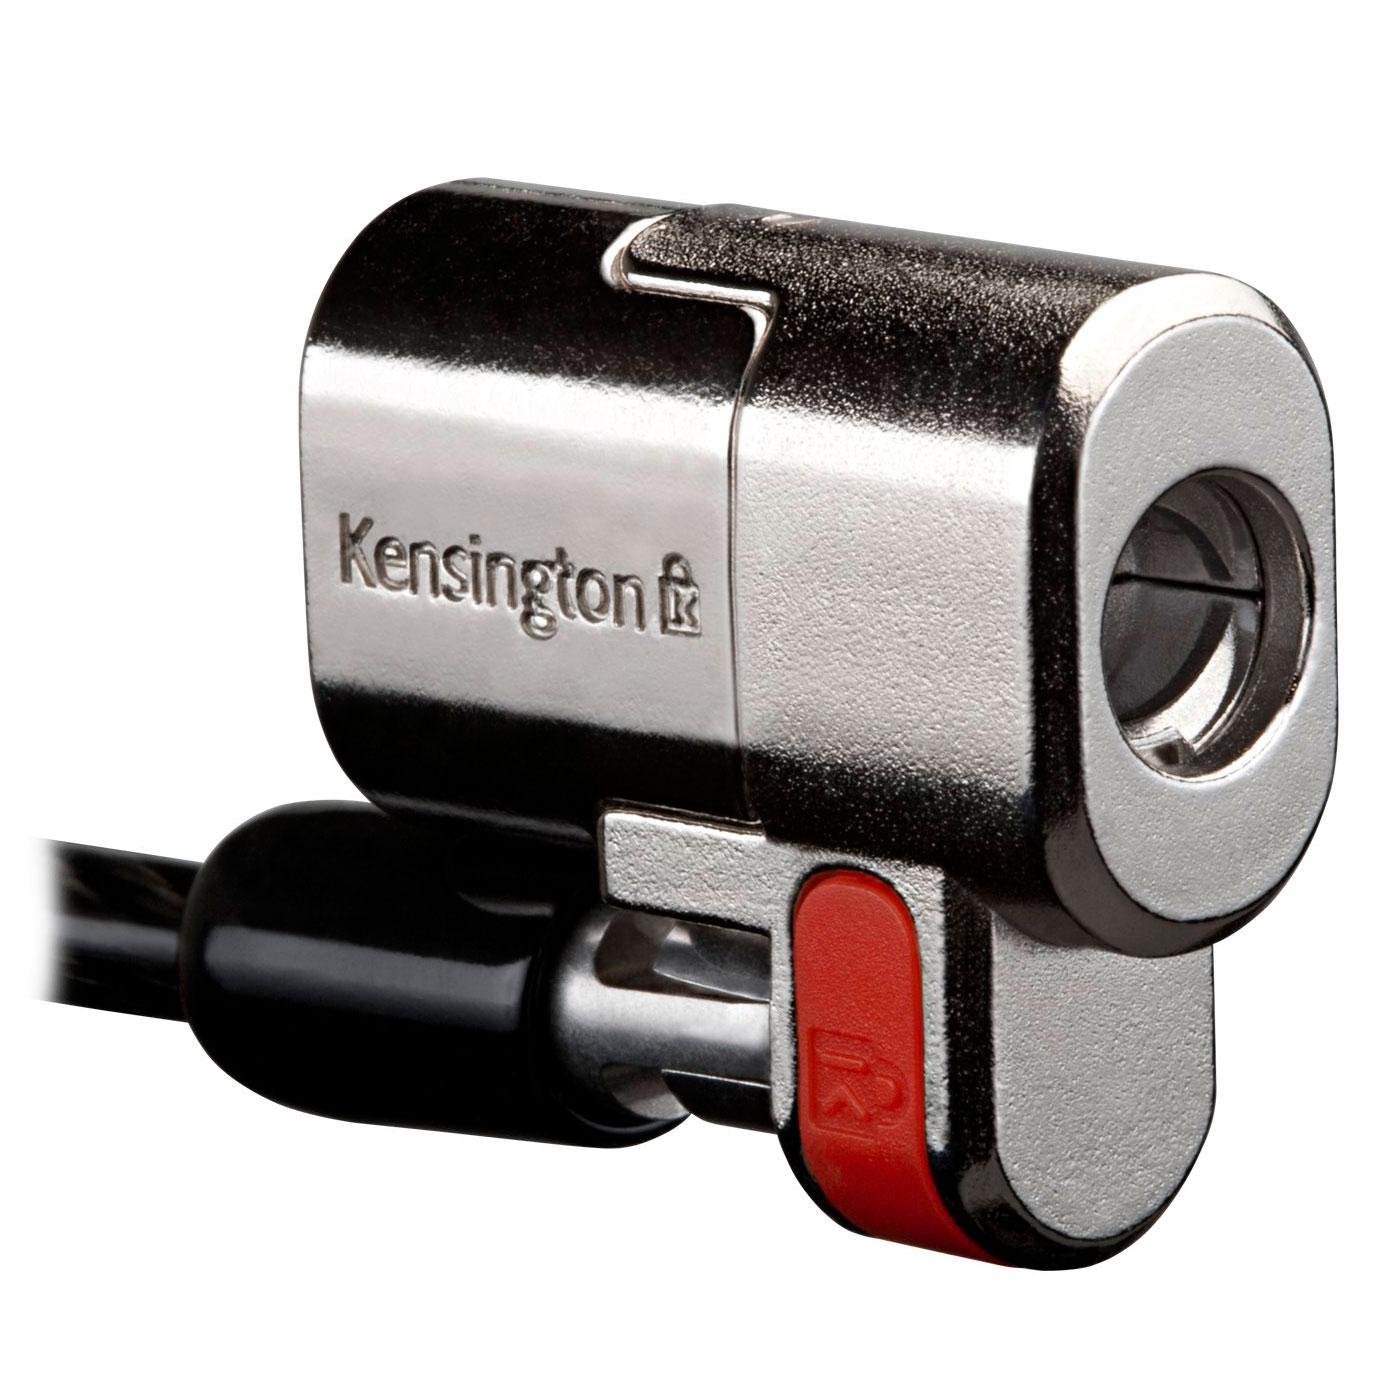 kensington clicksafe for dell k67974ww achat antivol pc portable kensington pour. Black Bedroom Furniture Sets. Home Design Ideas